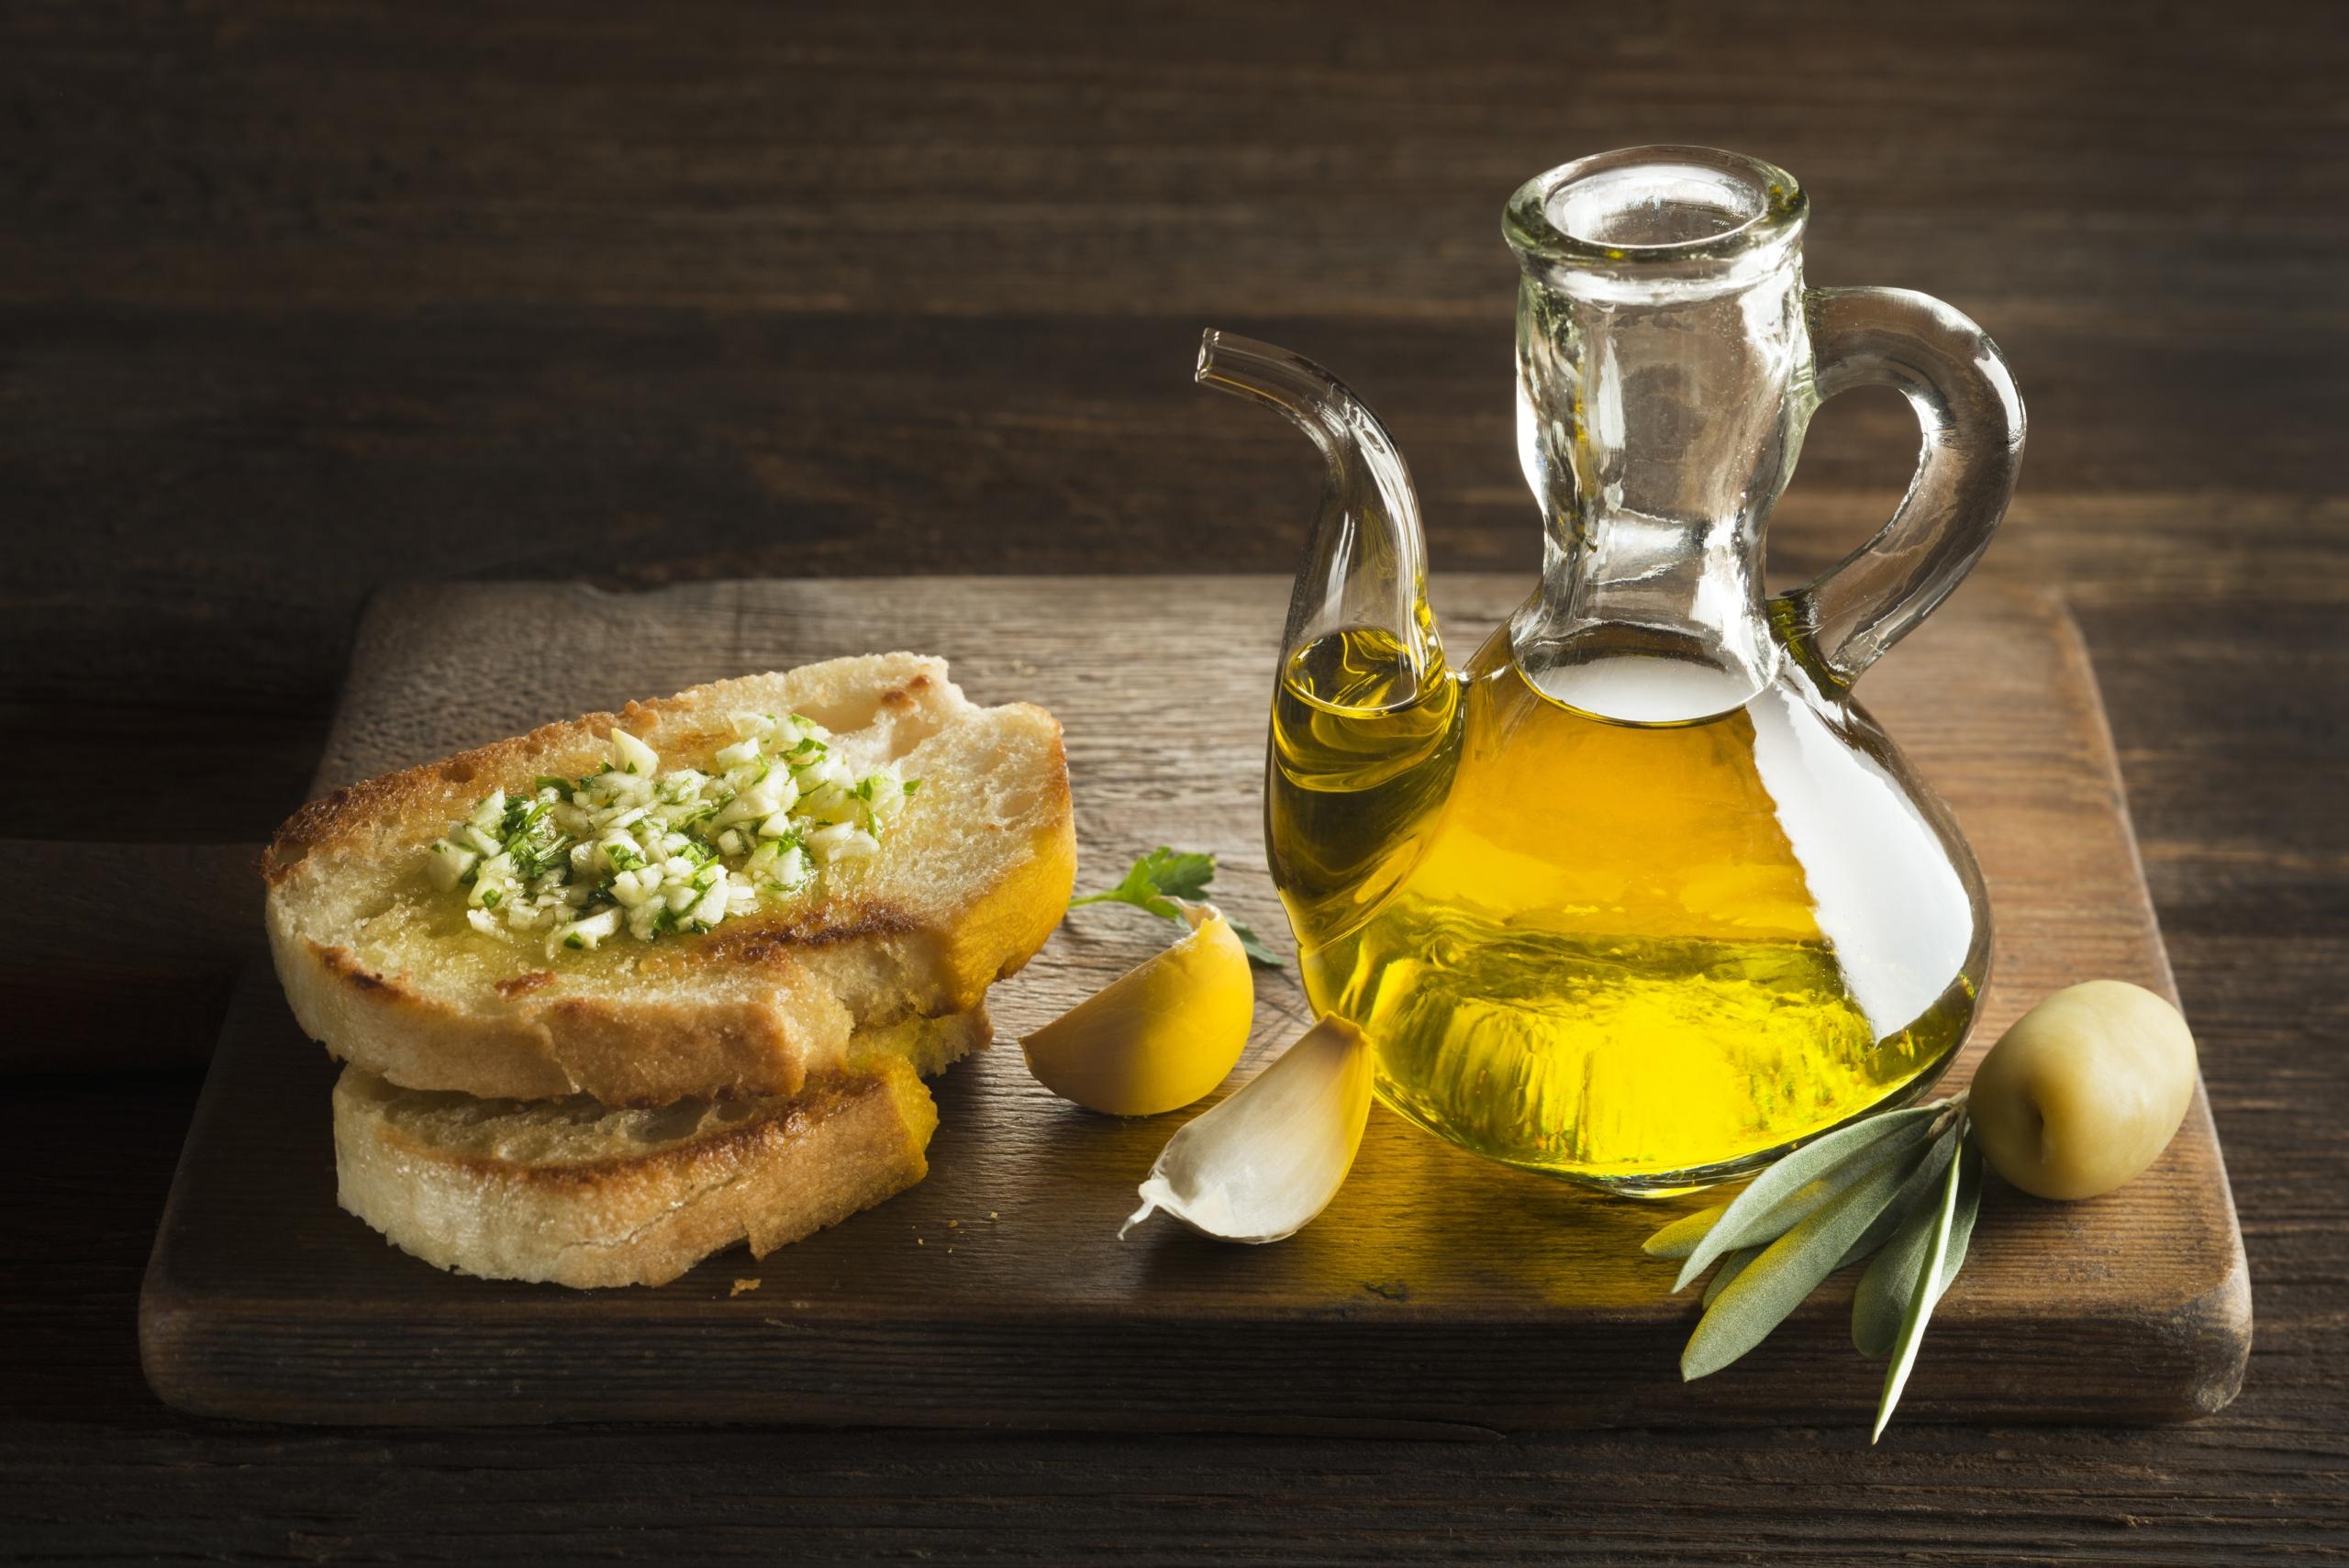 Olivenöl auf Toastbrot mit Knoblauch